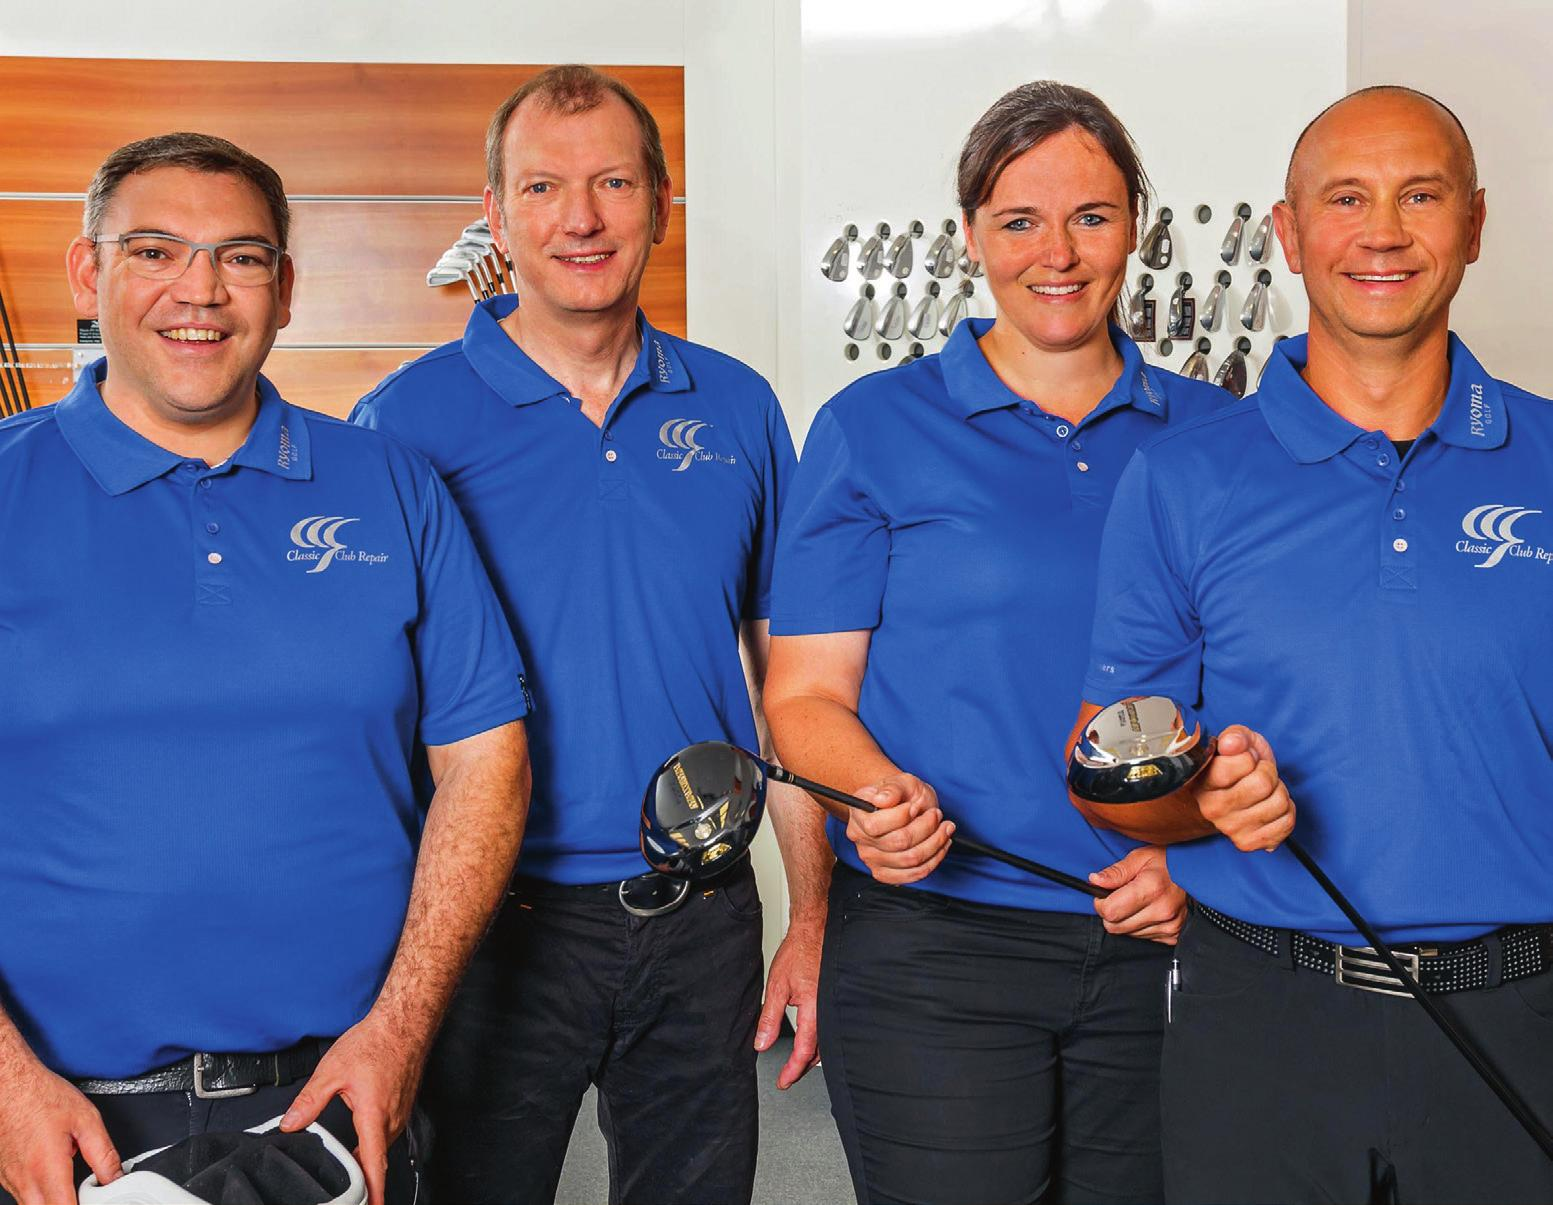 Das CCR-Team: (v.l.) Oliver Köhnen, Dietmar Erhardt, Steffi Kirchmayr und Michael Brünner. Fotos: Classic Club Repair (6)